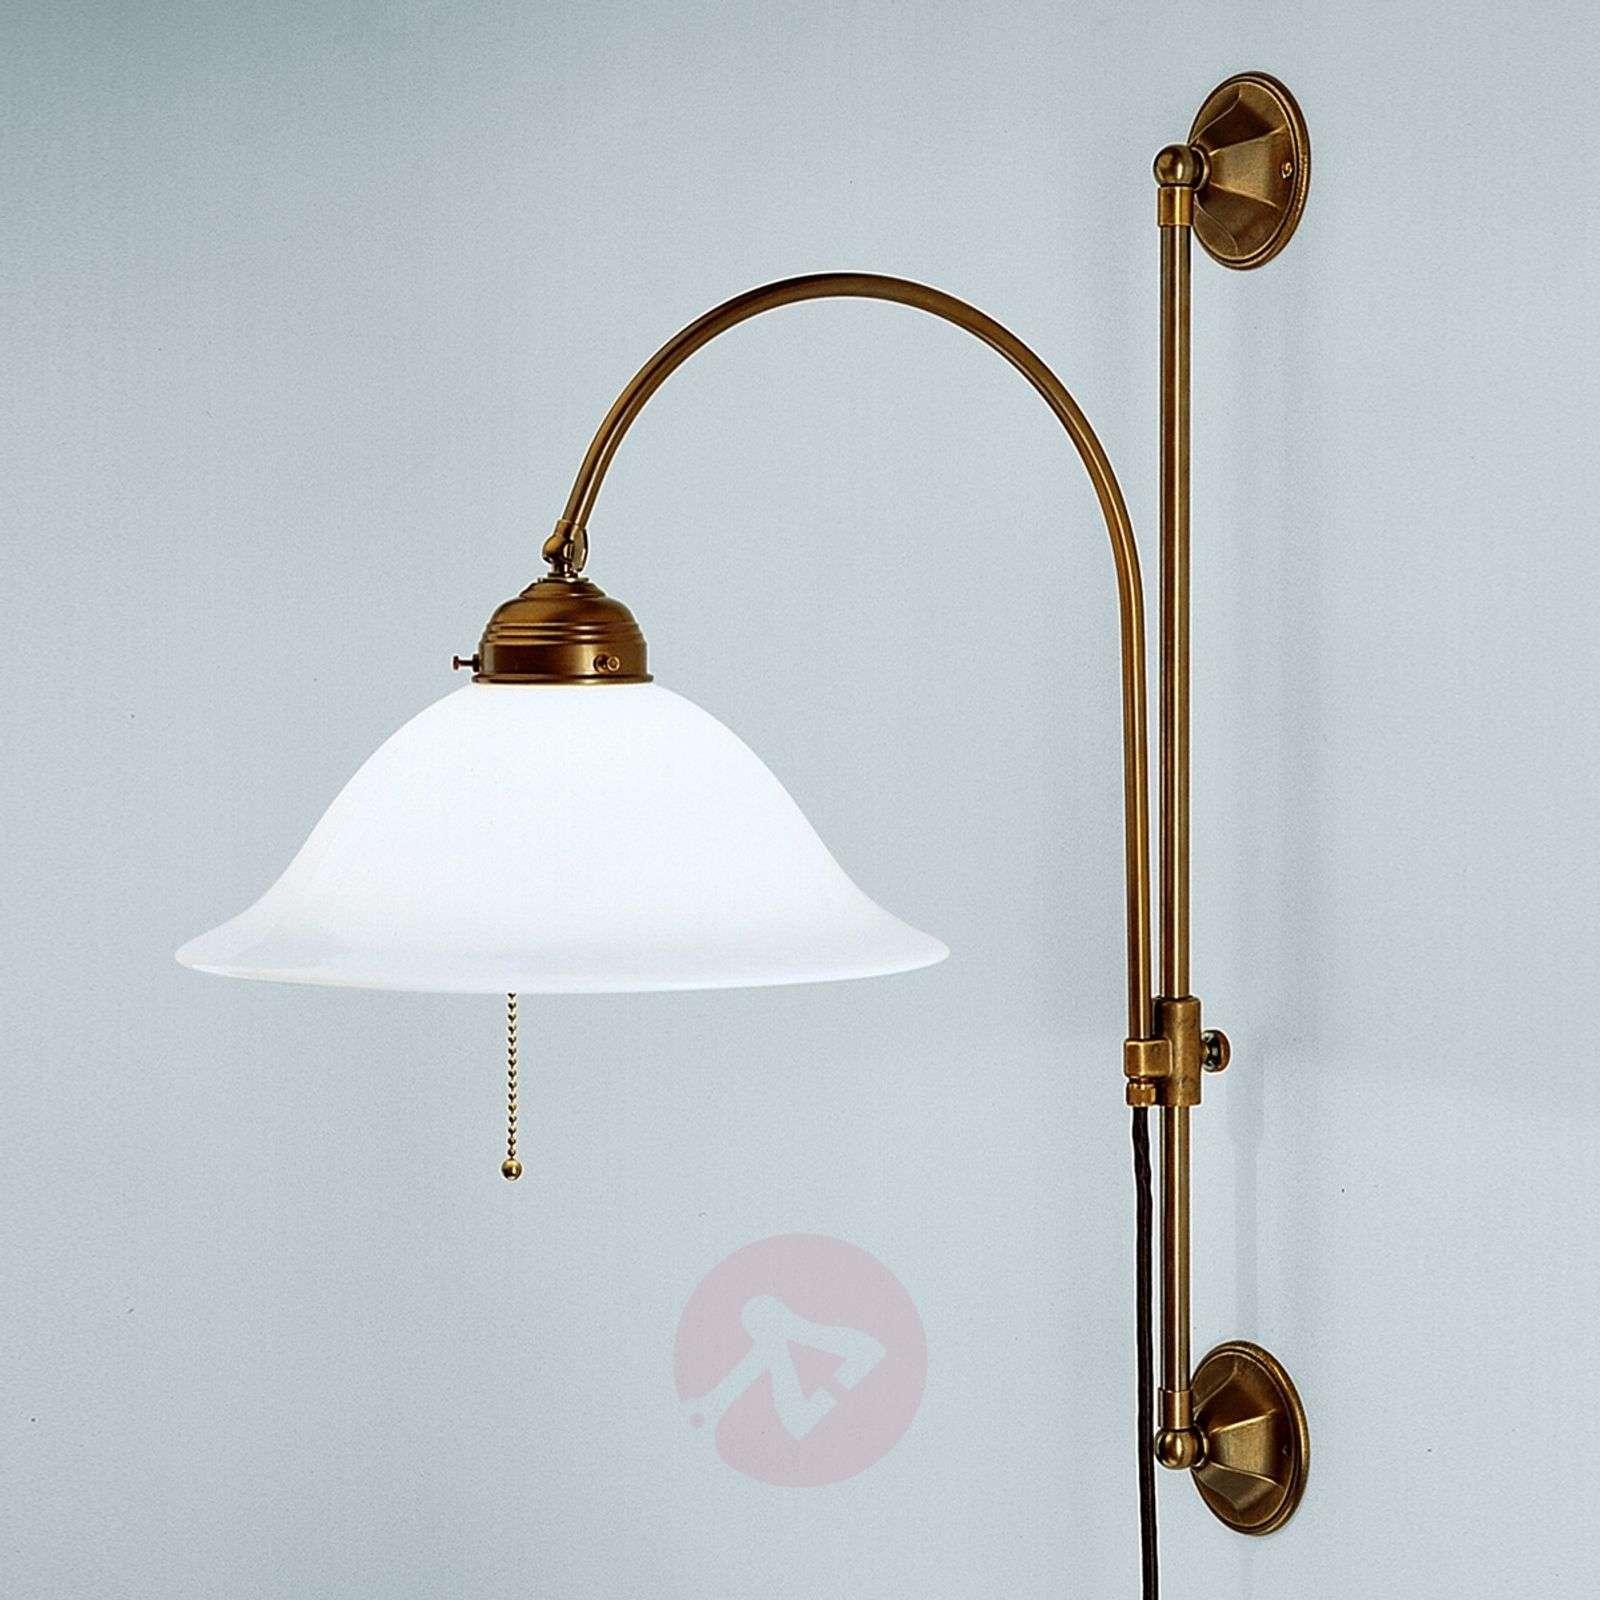 Rhodes - protruding brass wall light_1542113_1